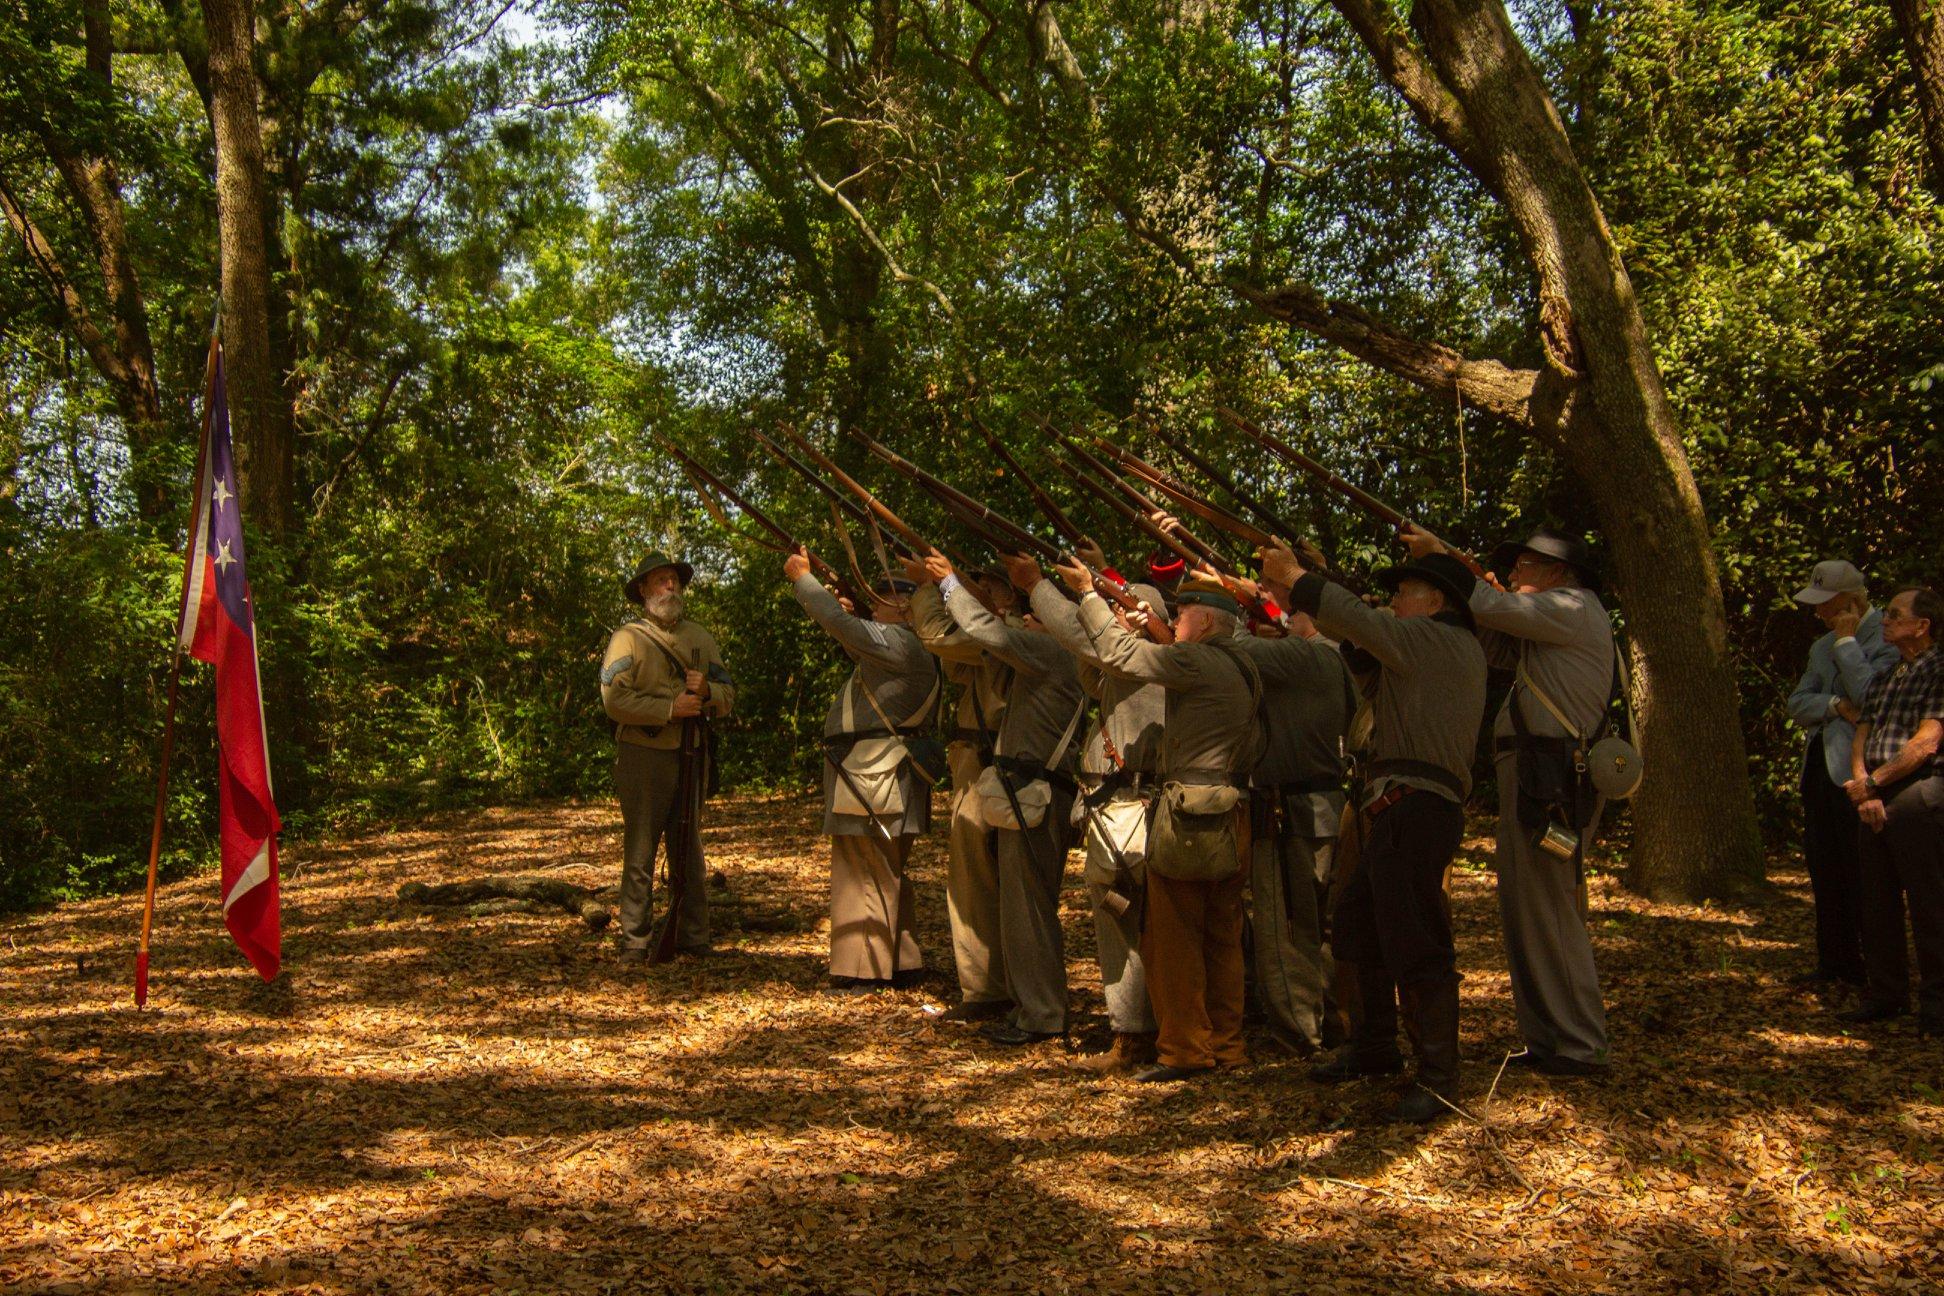 The annual anniversary of the Battle of Secessionville 21